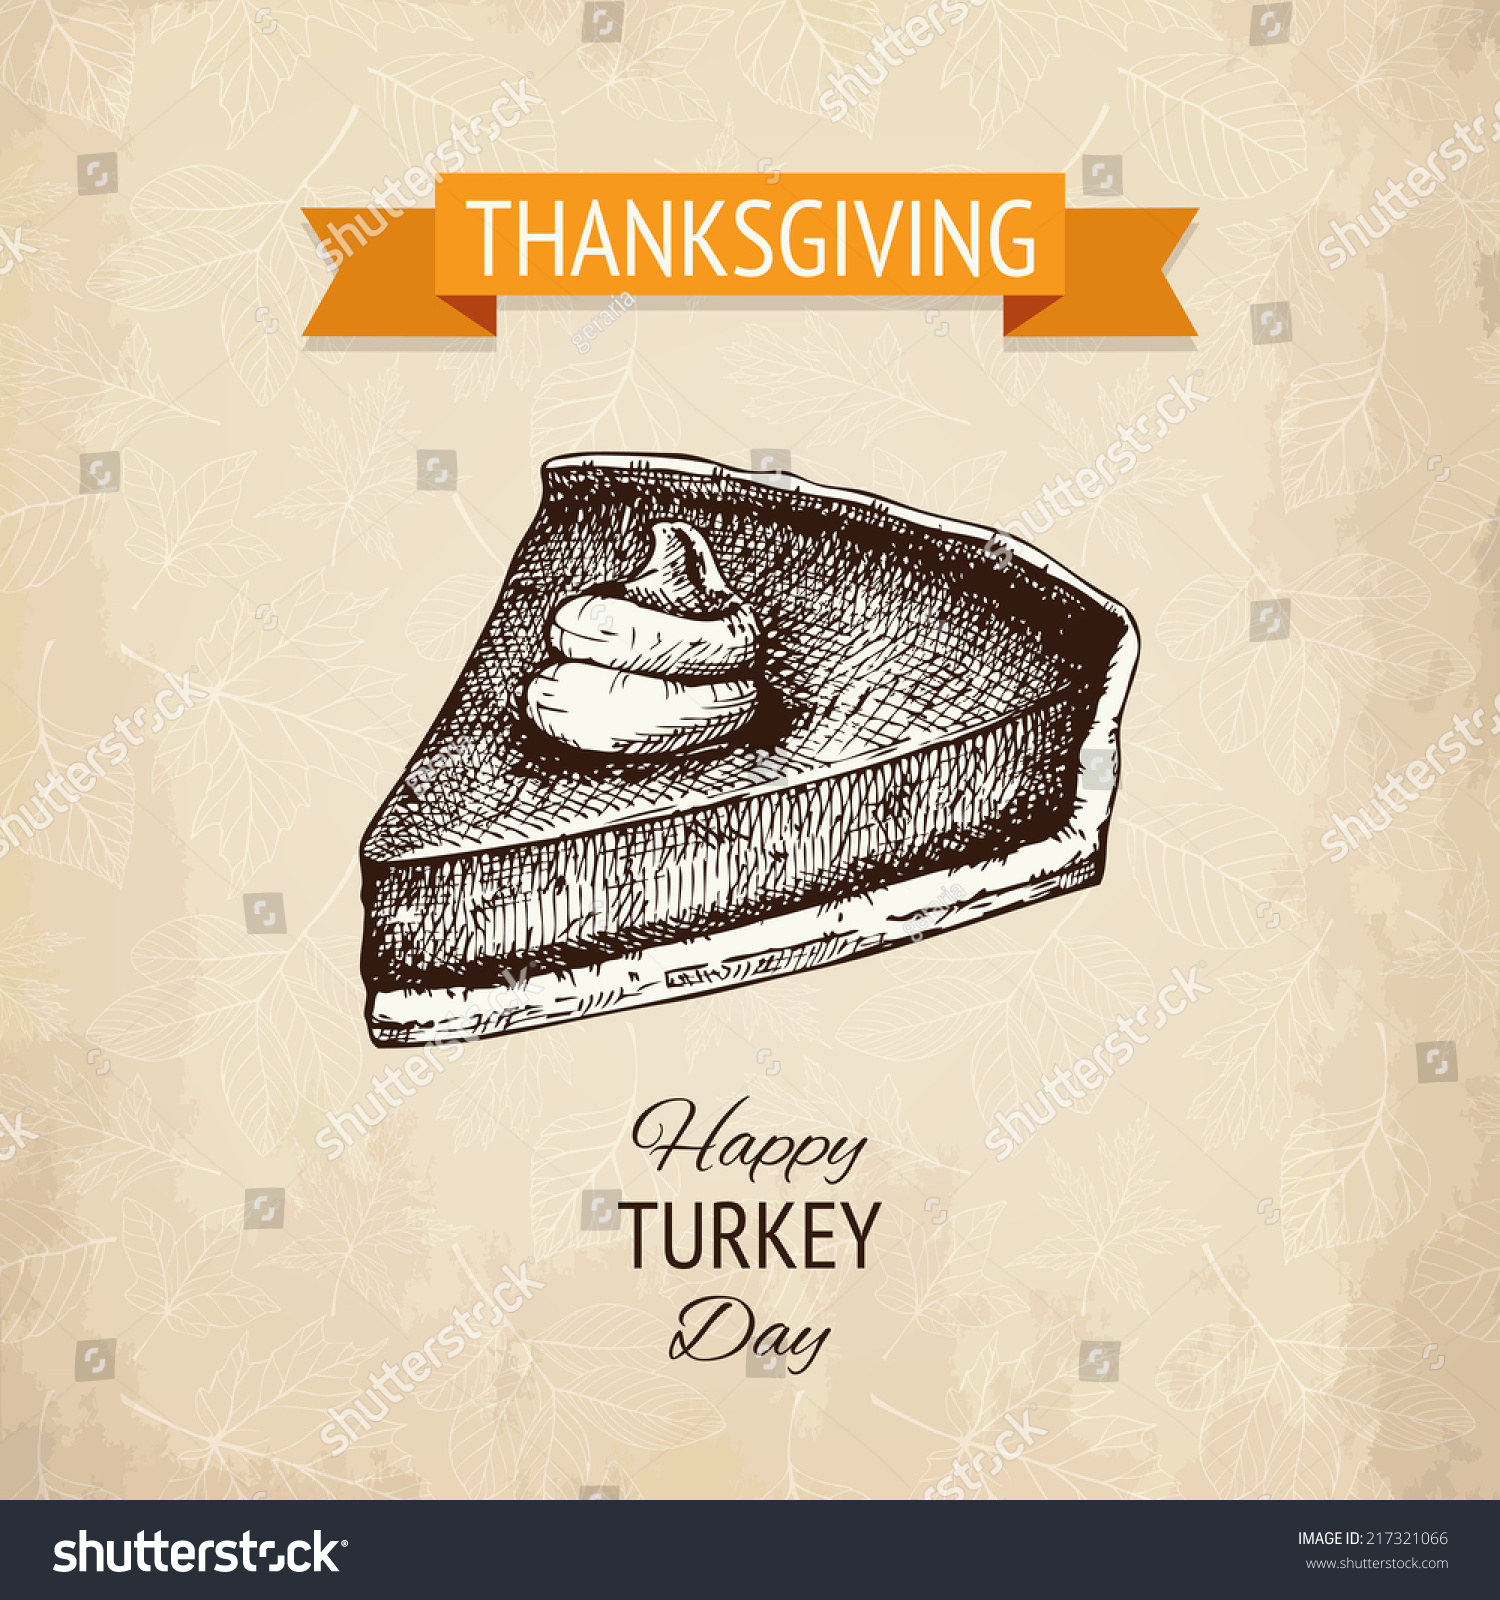 Vector Illustration With Ink Hand Drawn Pumpkin Pie For Thanksgiving Day Design Vintage Turkey